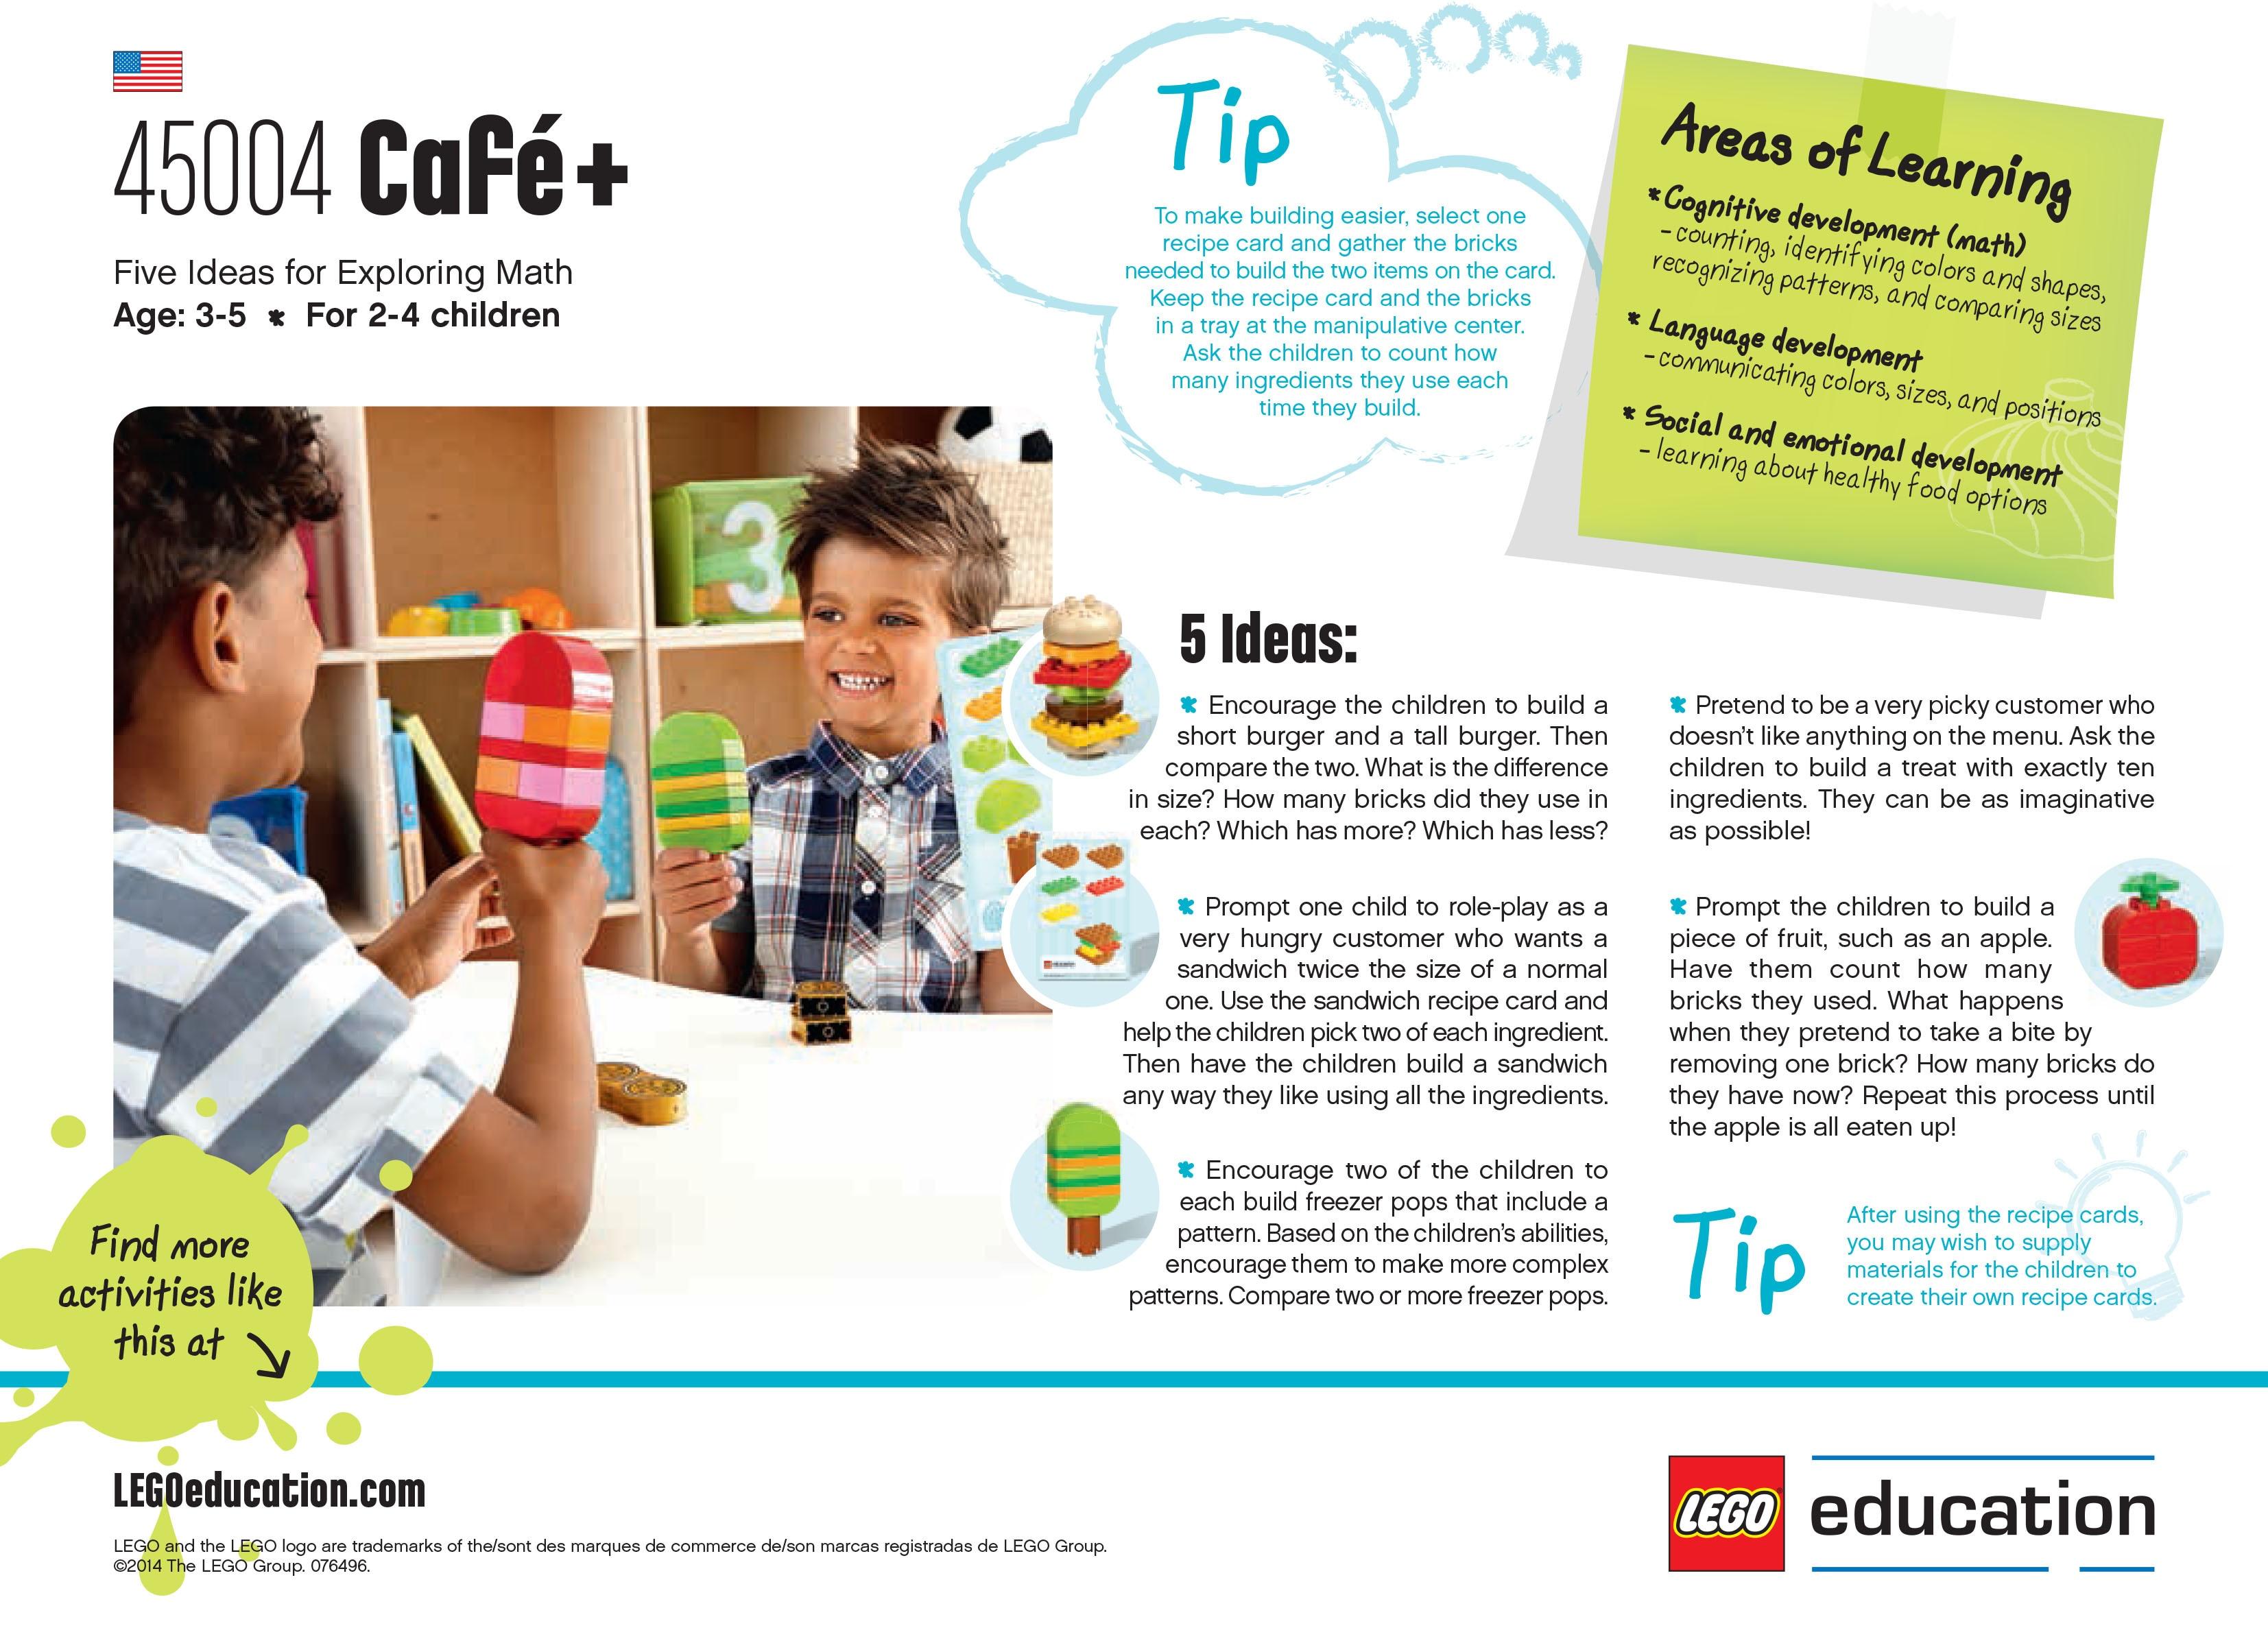 Café+ activity ideas